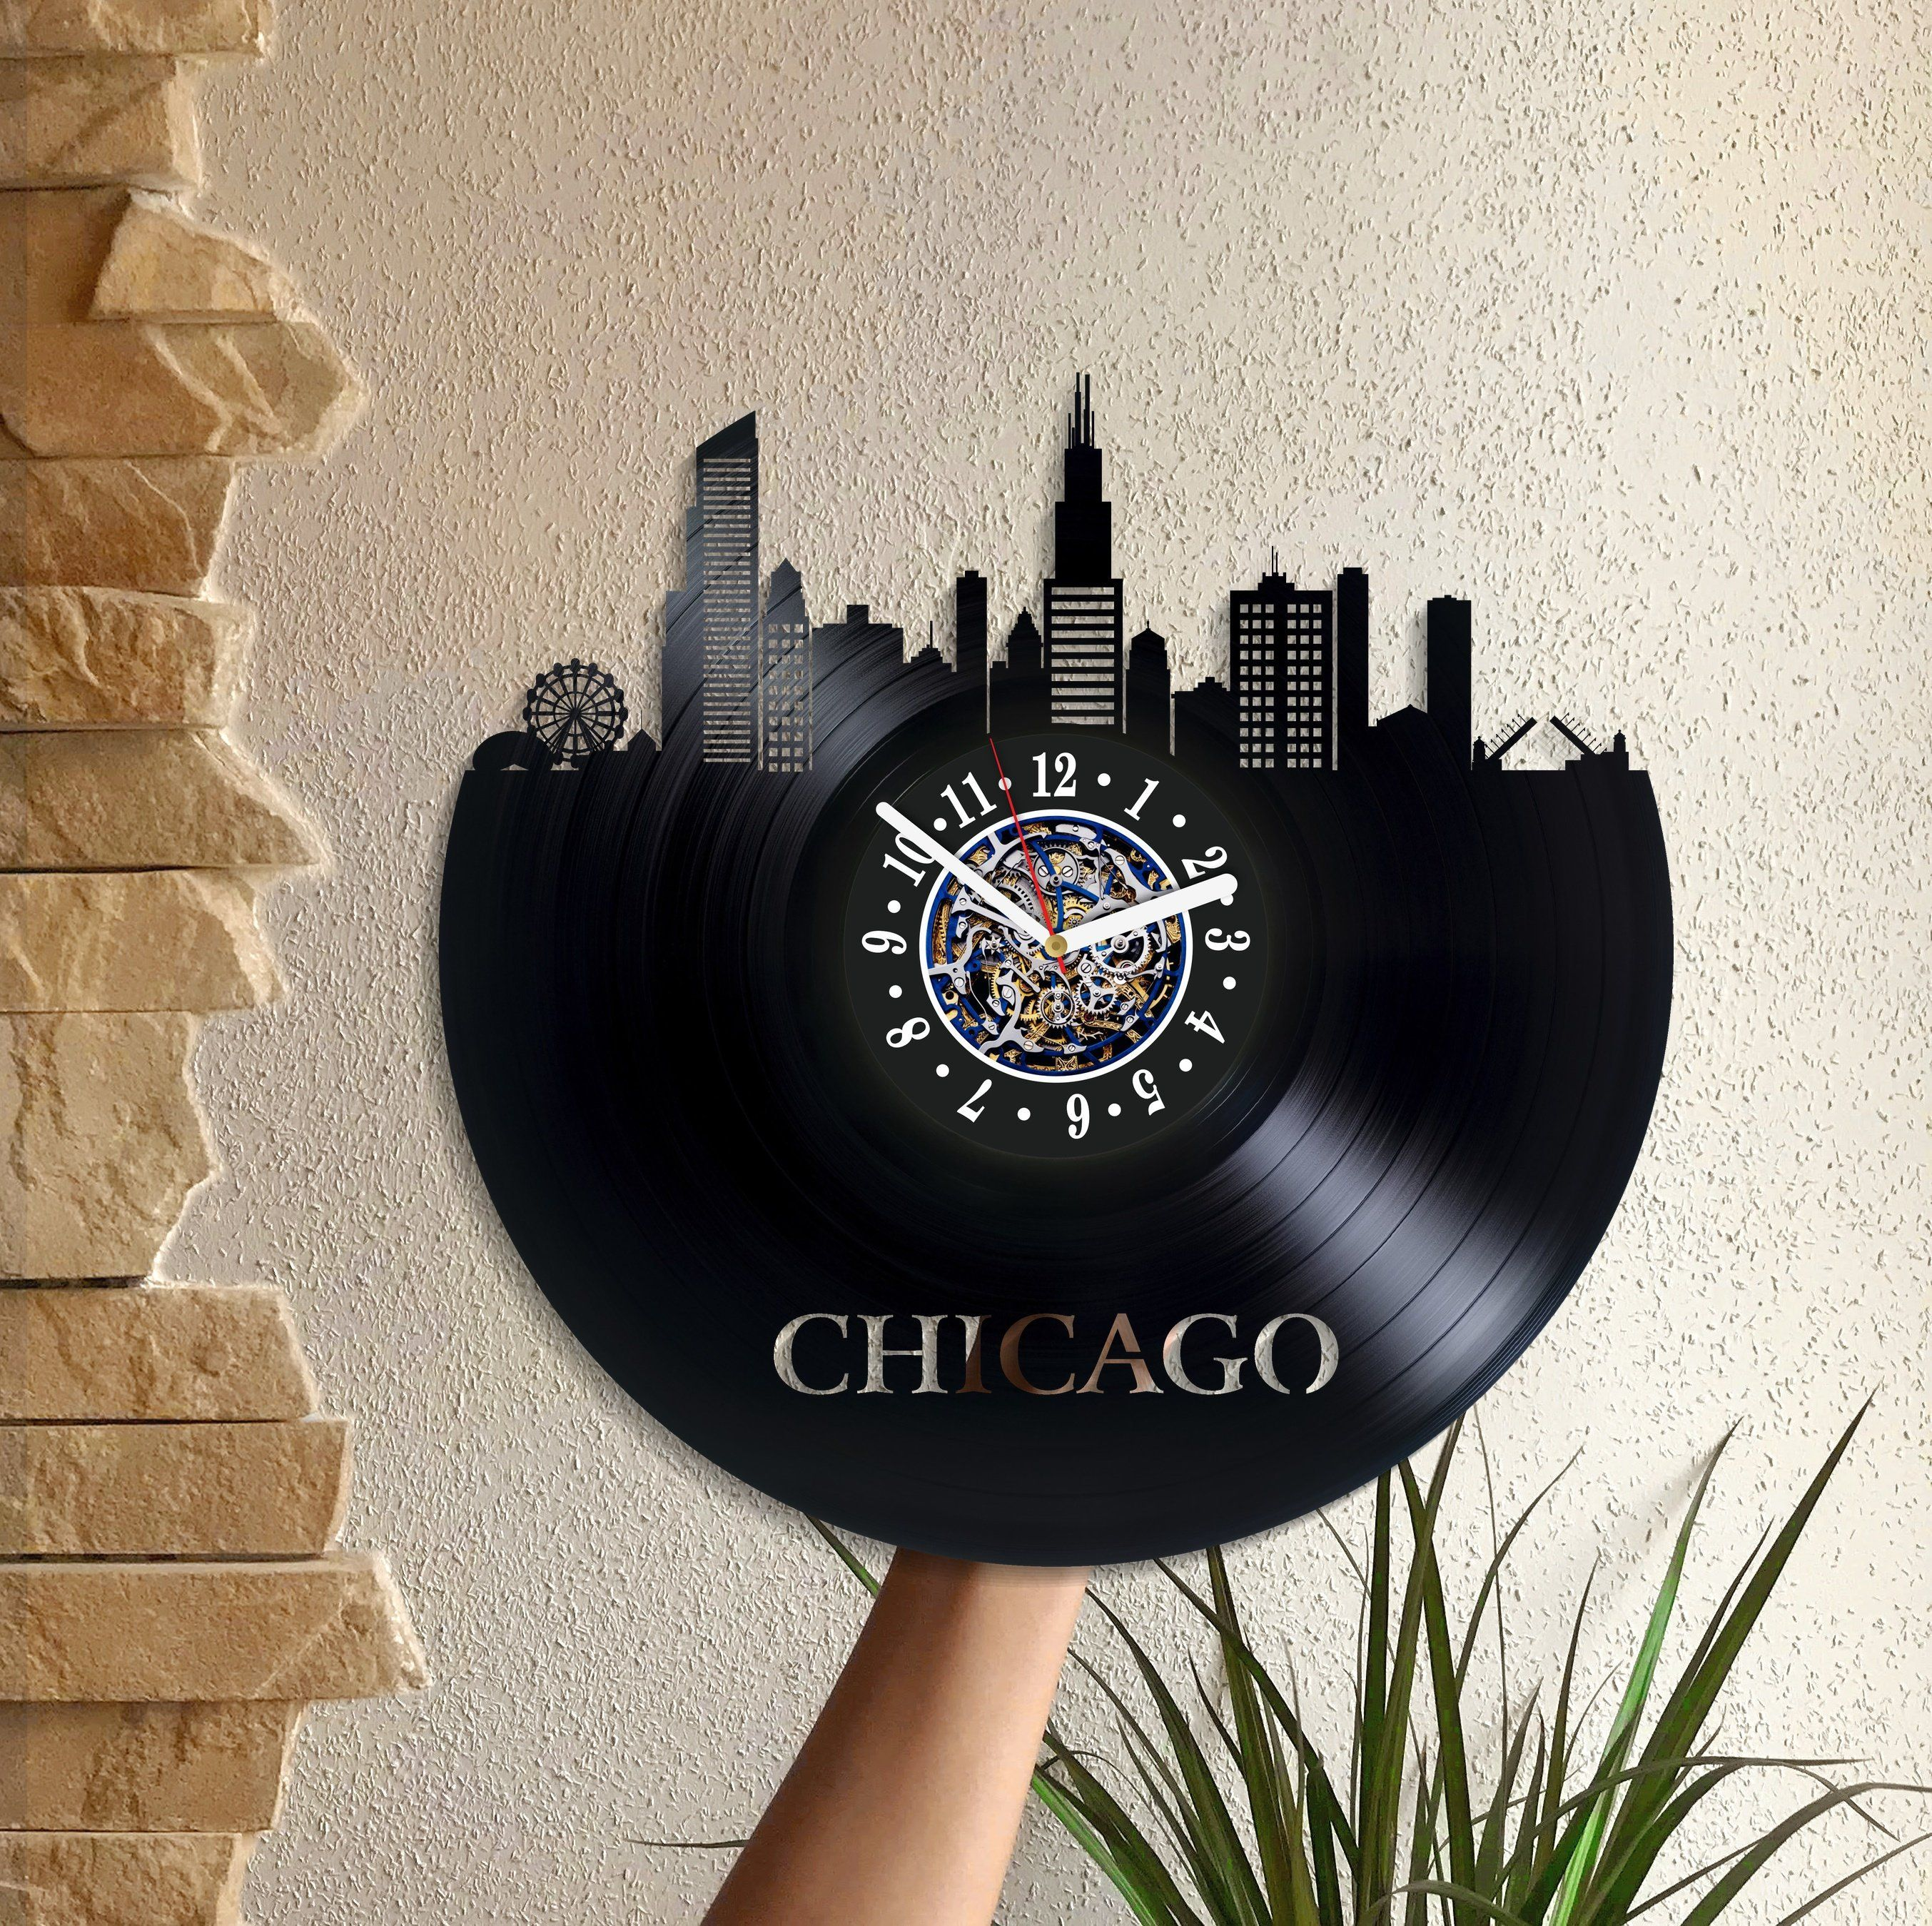 Chicago Wall Clock Birthday Gift For Woman Usa Art Lp Vinyl Retro Record Wall Clock Vintage City Art Xmas Gift Printed Clocks Vintage Clock Vintage Wall Clock